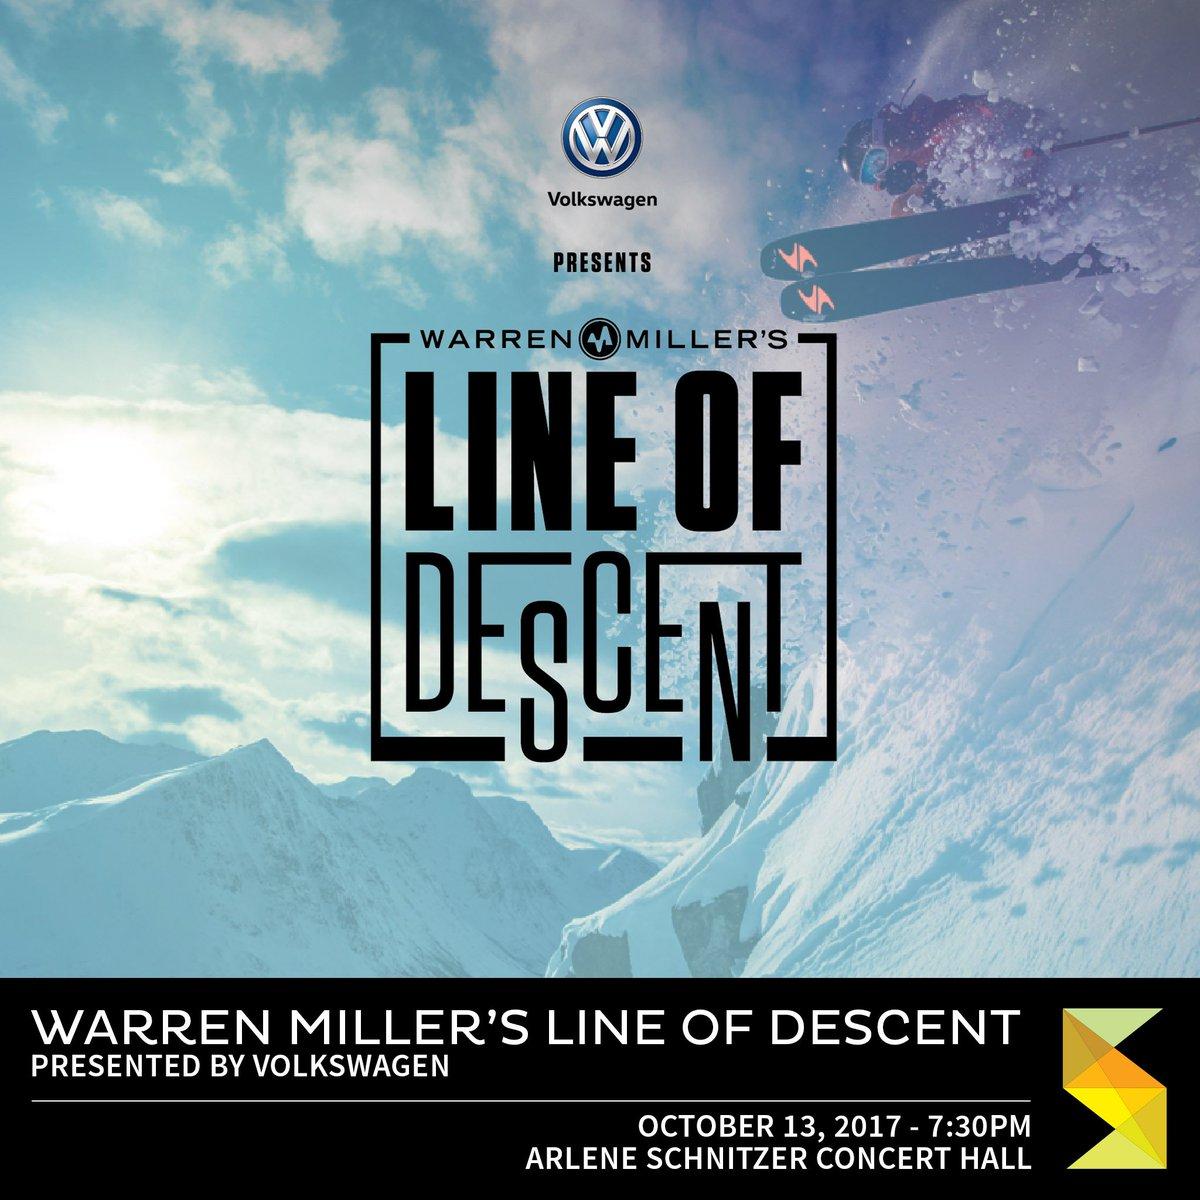 Portland On Twitter Warren Millers Line Of Descent Arlene - Arlene schnitzer tickets